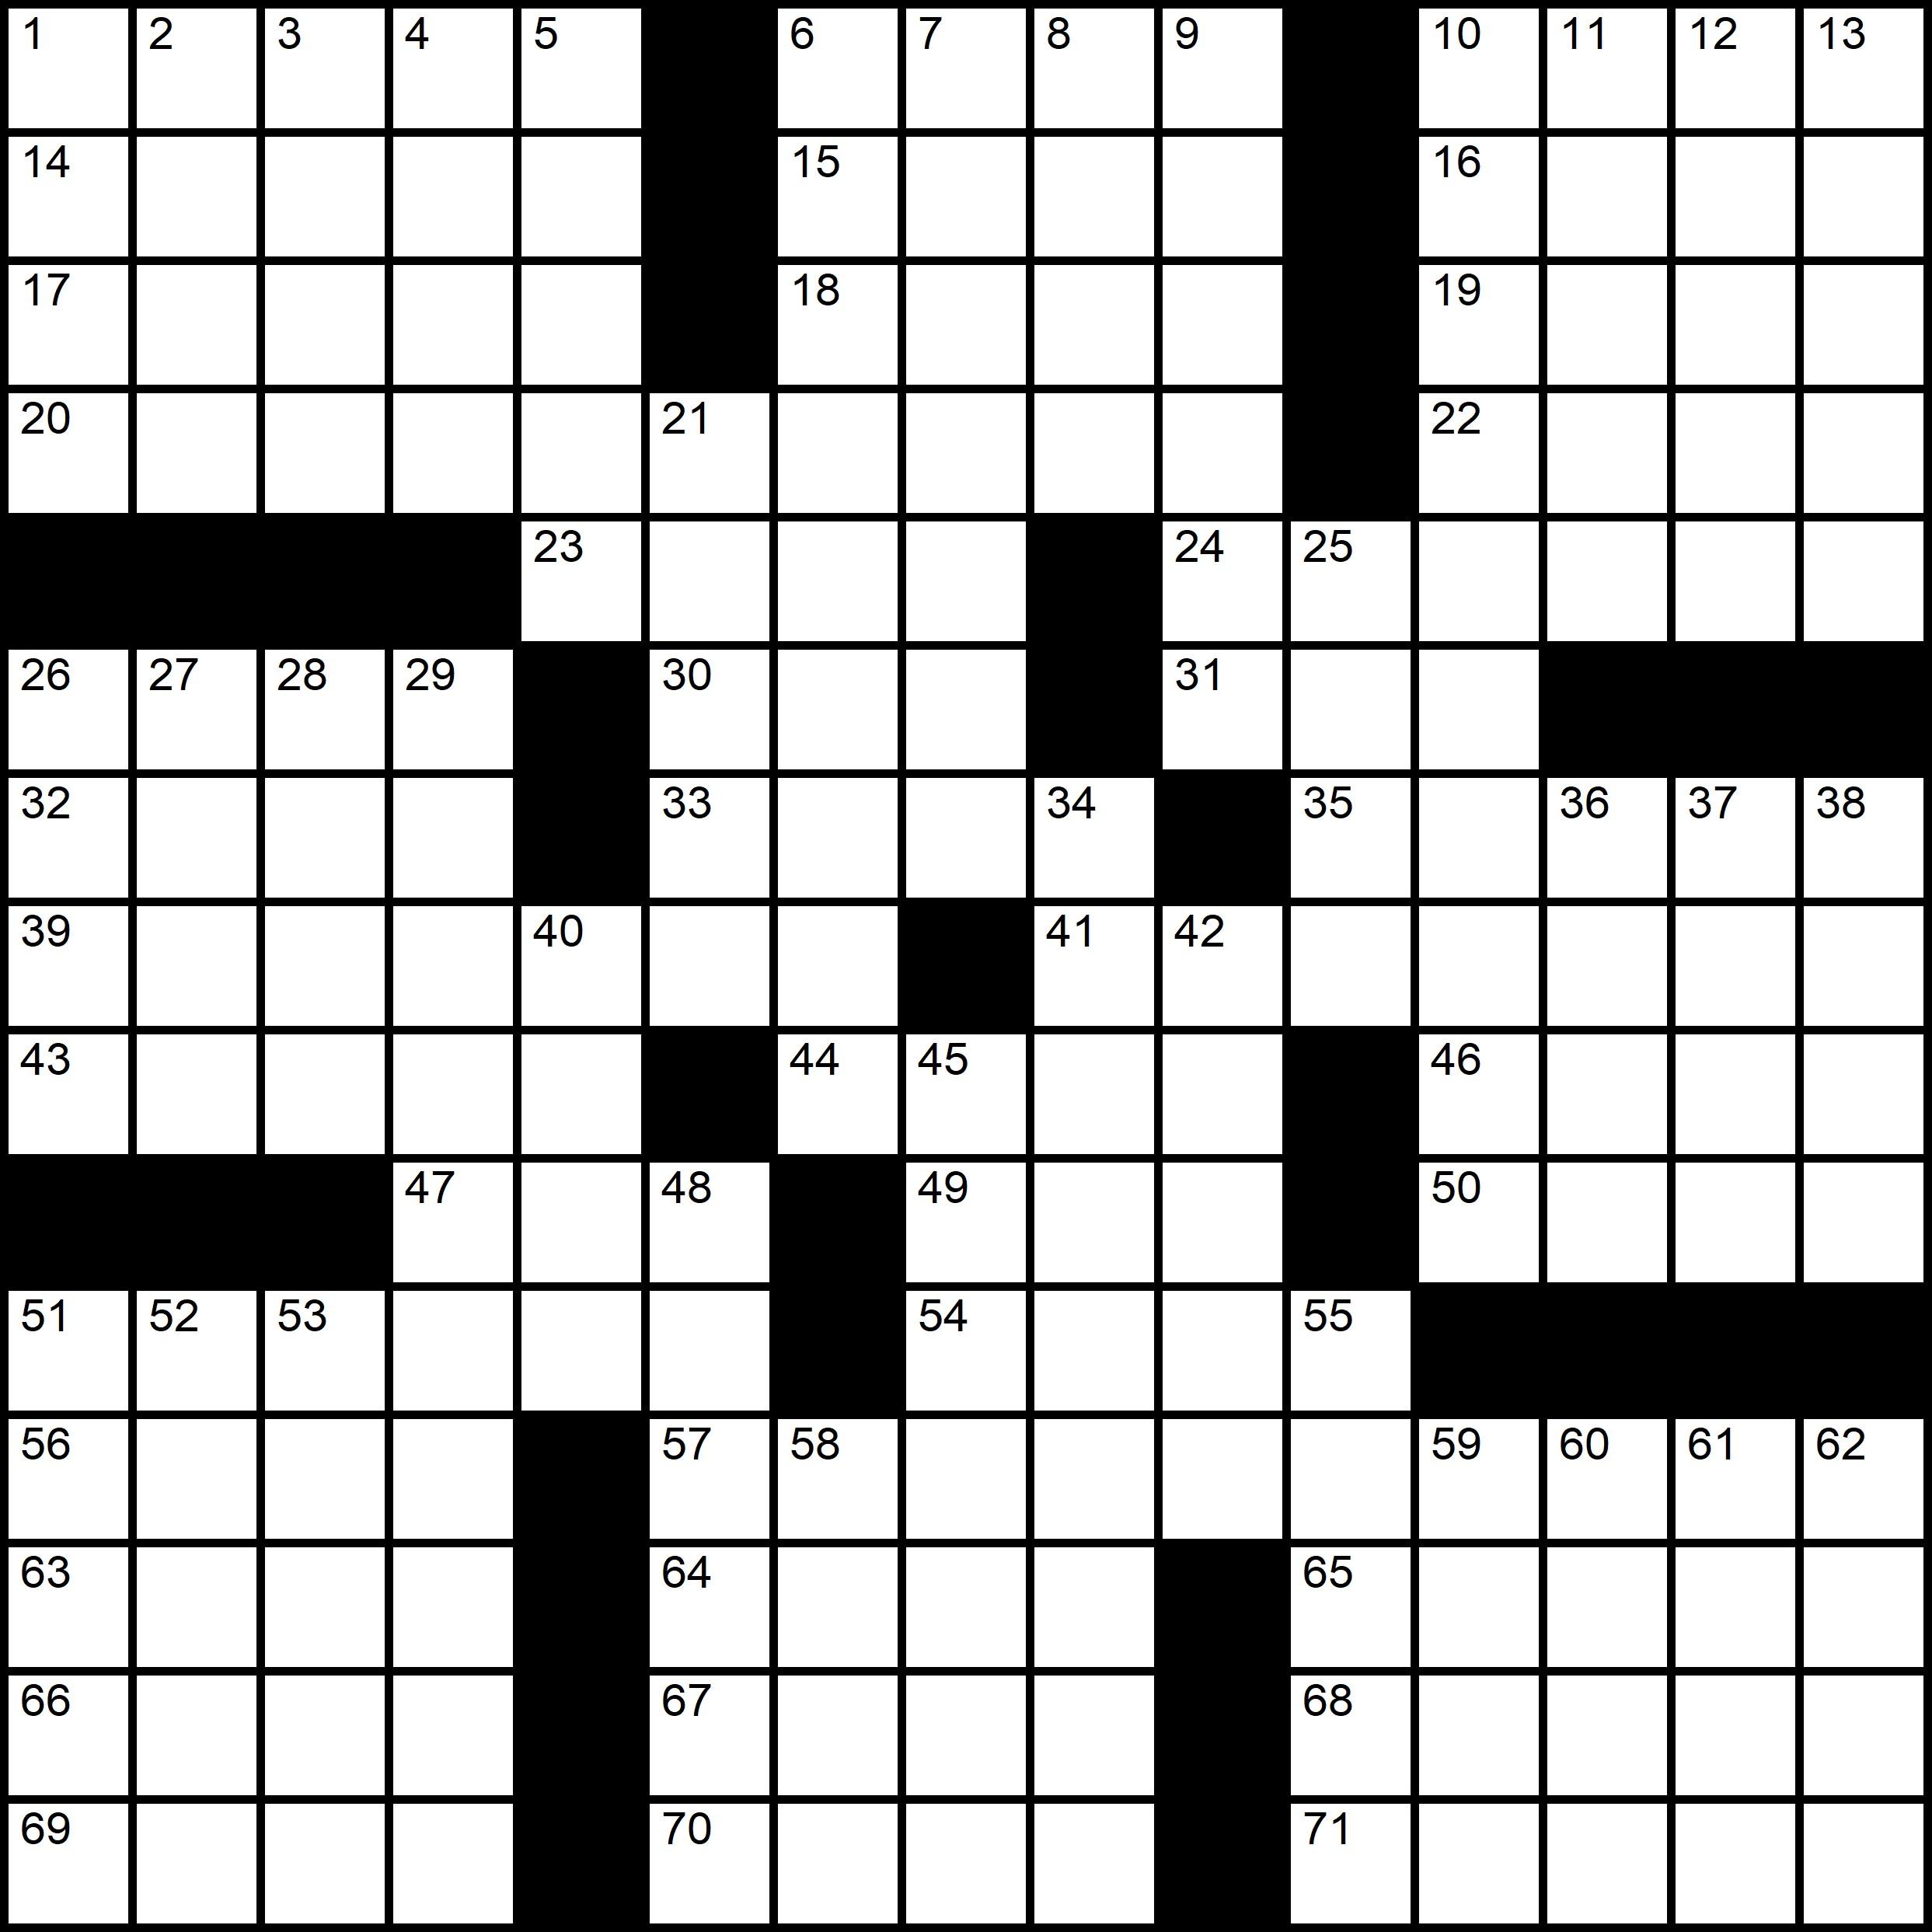 Themed Crossword Sicily Italy -  Pascal Baylon-Dietmar Themed Crossword Series - Crossword number two